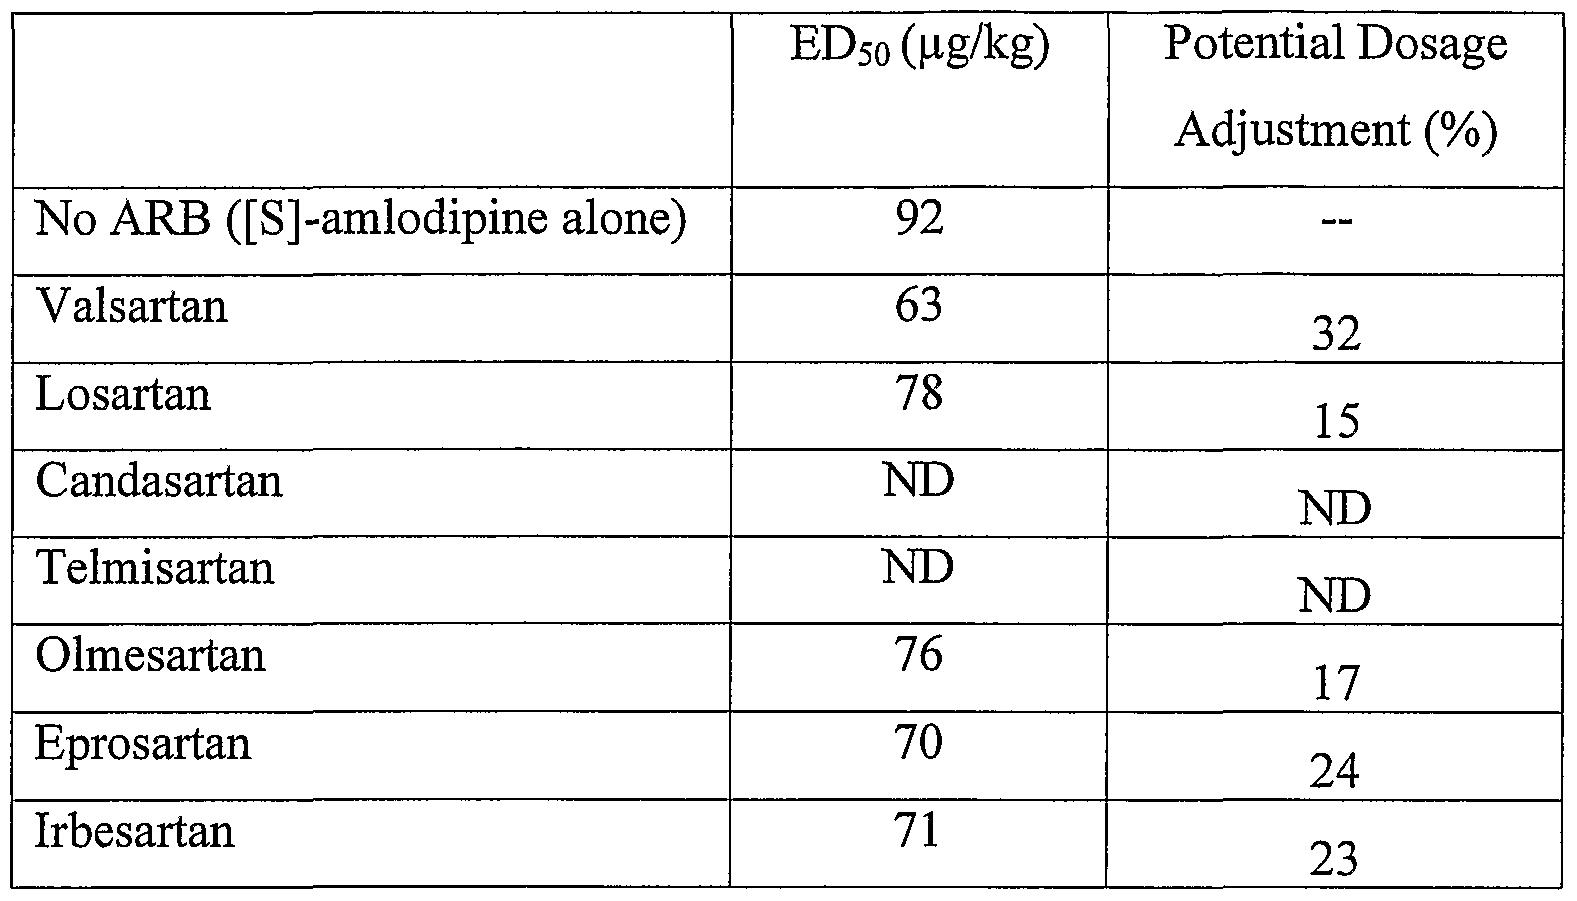 Levamlodipine fdating